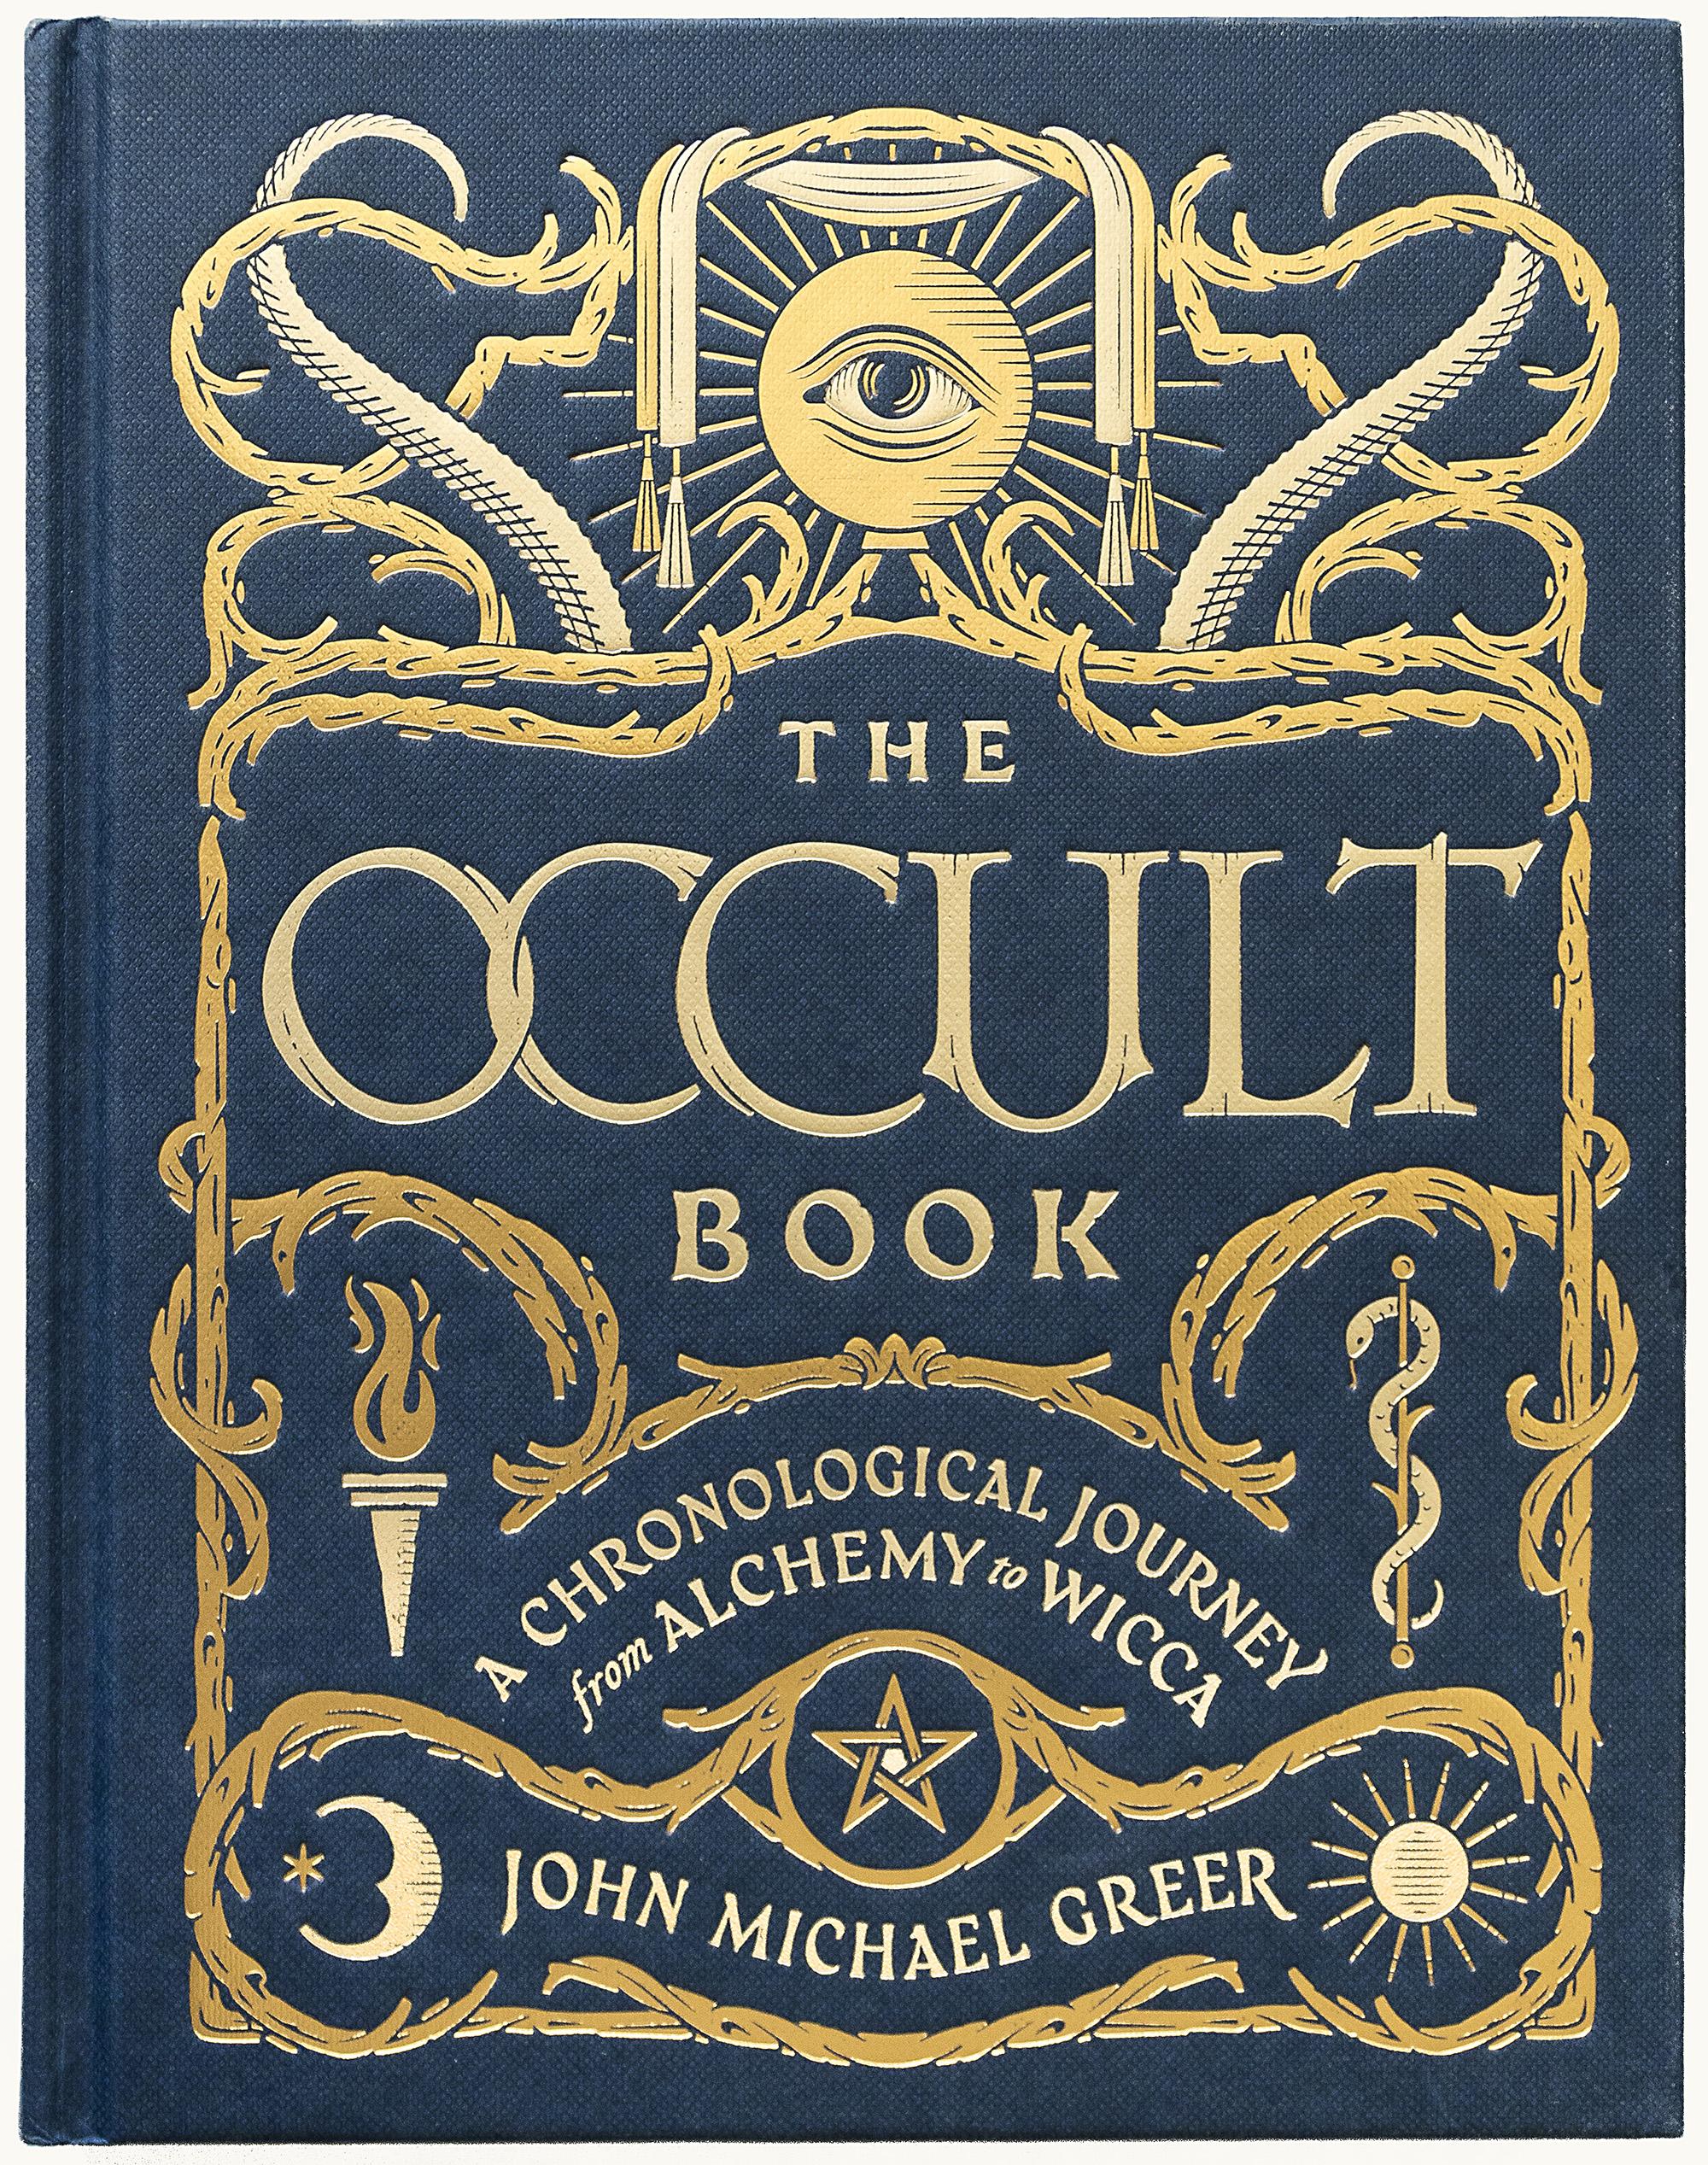 OccultBook.jpg